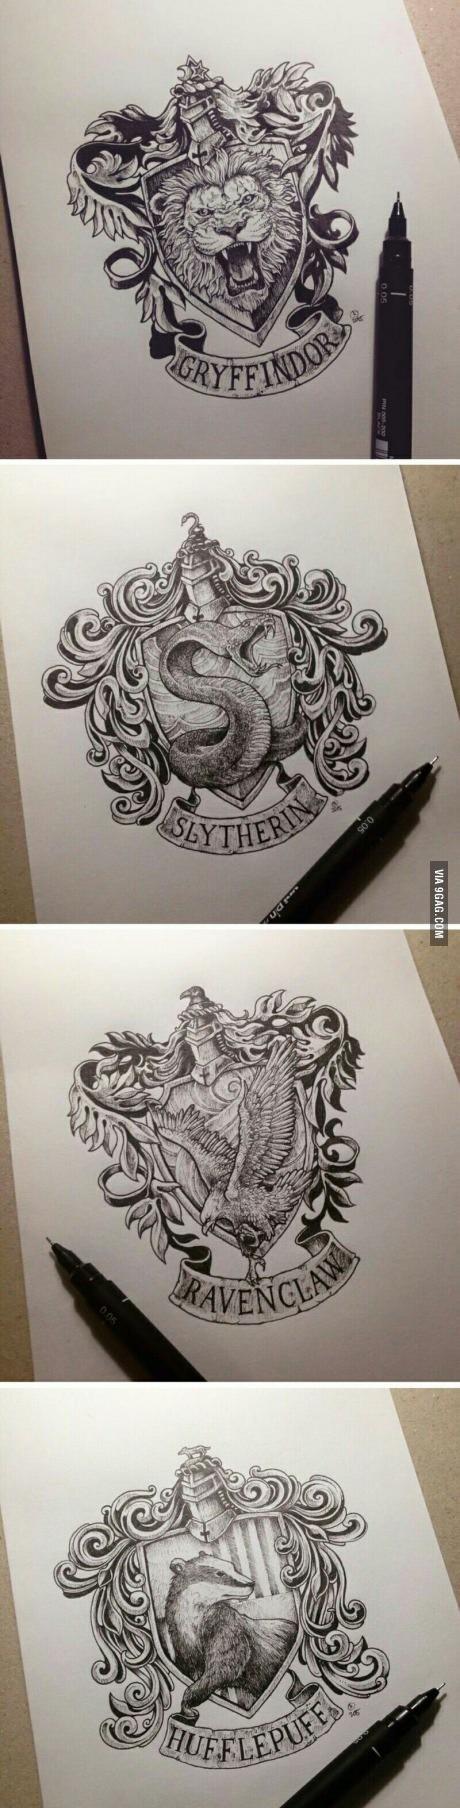 Disegni pennarello delle casate di Hogwarts Grifondoro, Serpeverde,  Corvonero e Tassorosso. Hogwarts HP HarryPotter Fandom Magic Disegni